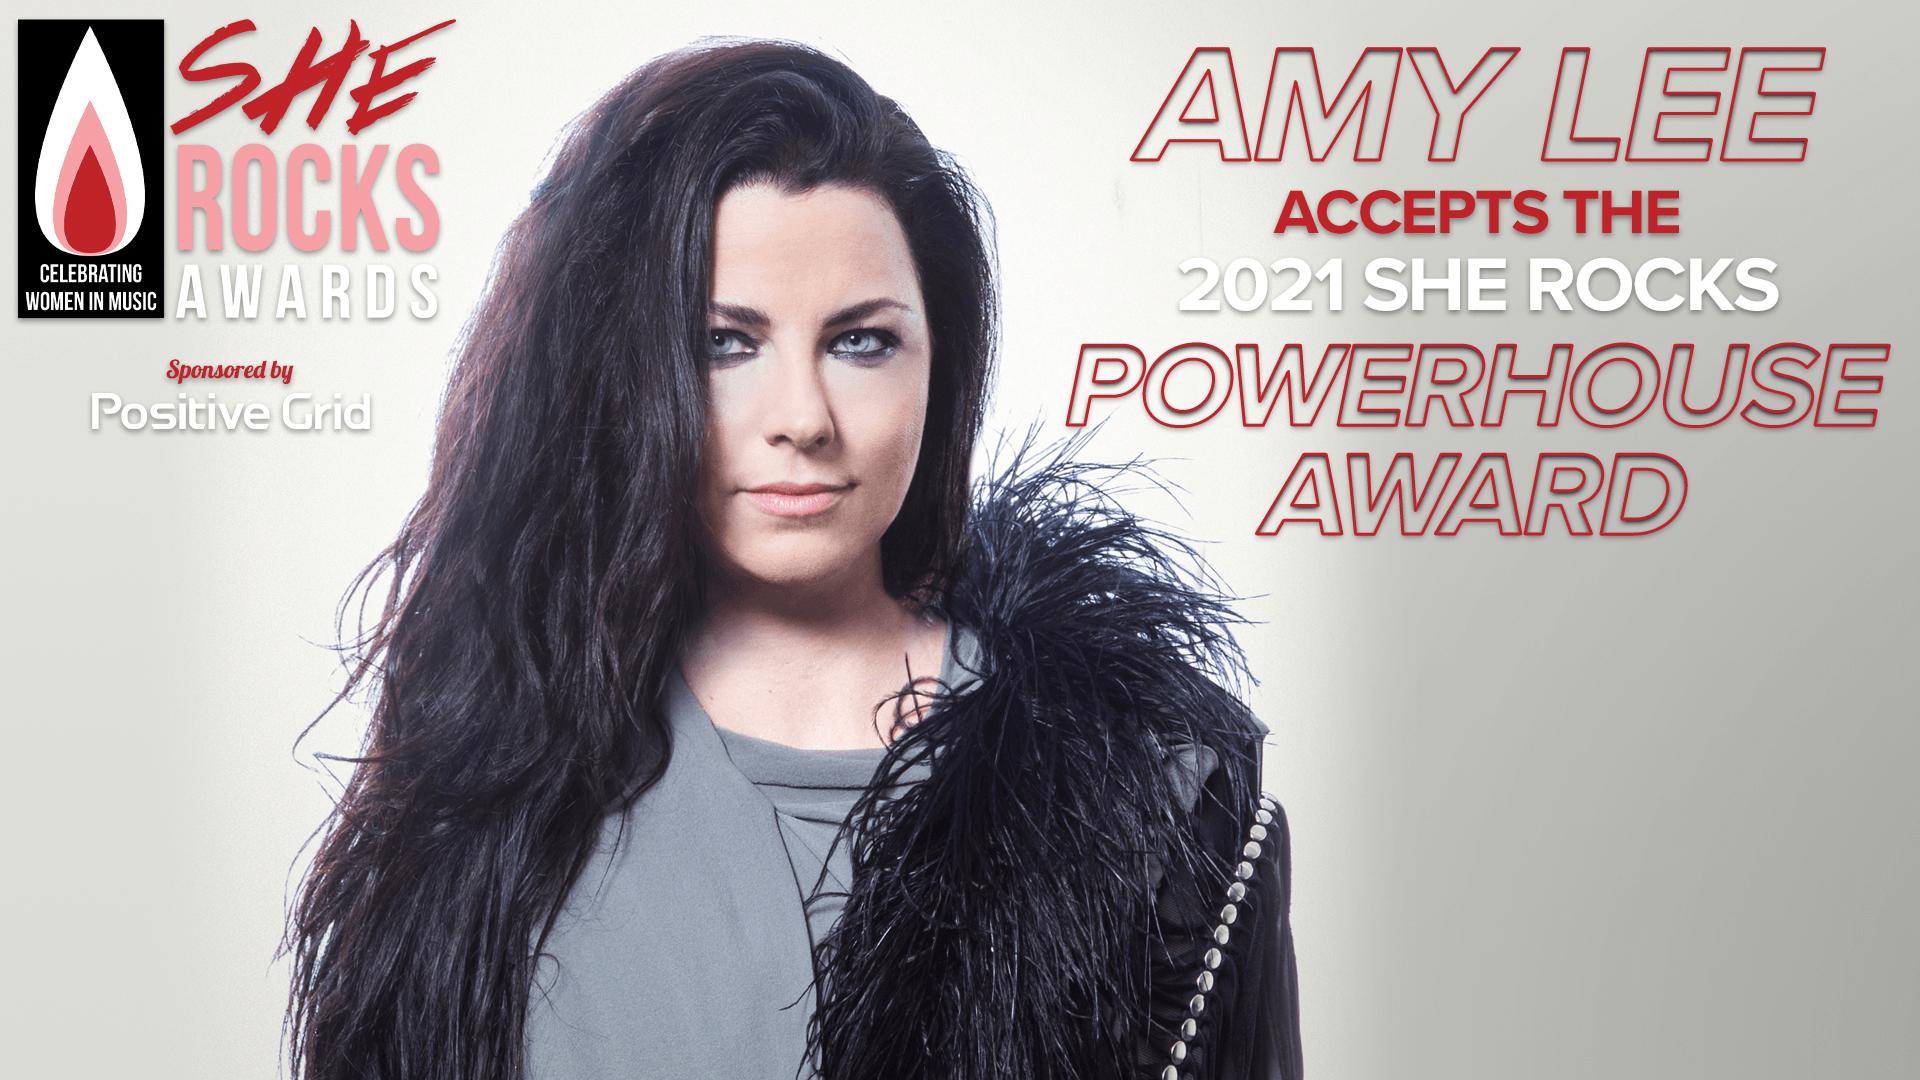 Amy Lee Accepts the Powerhouse Award | She Rocks Awards